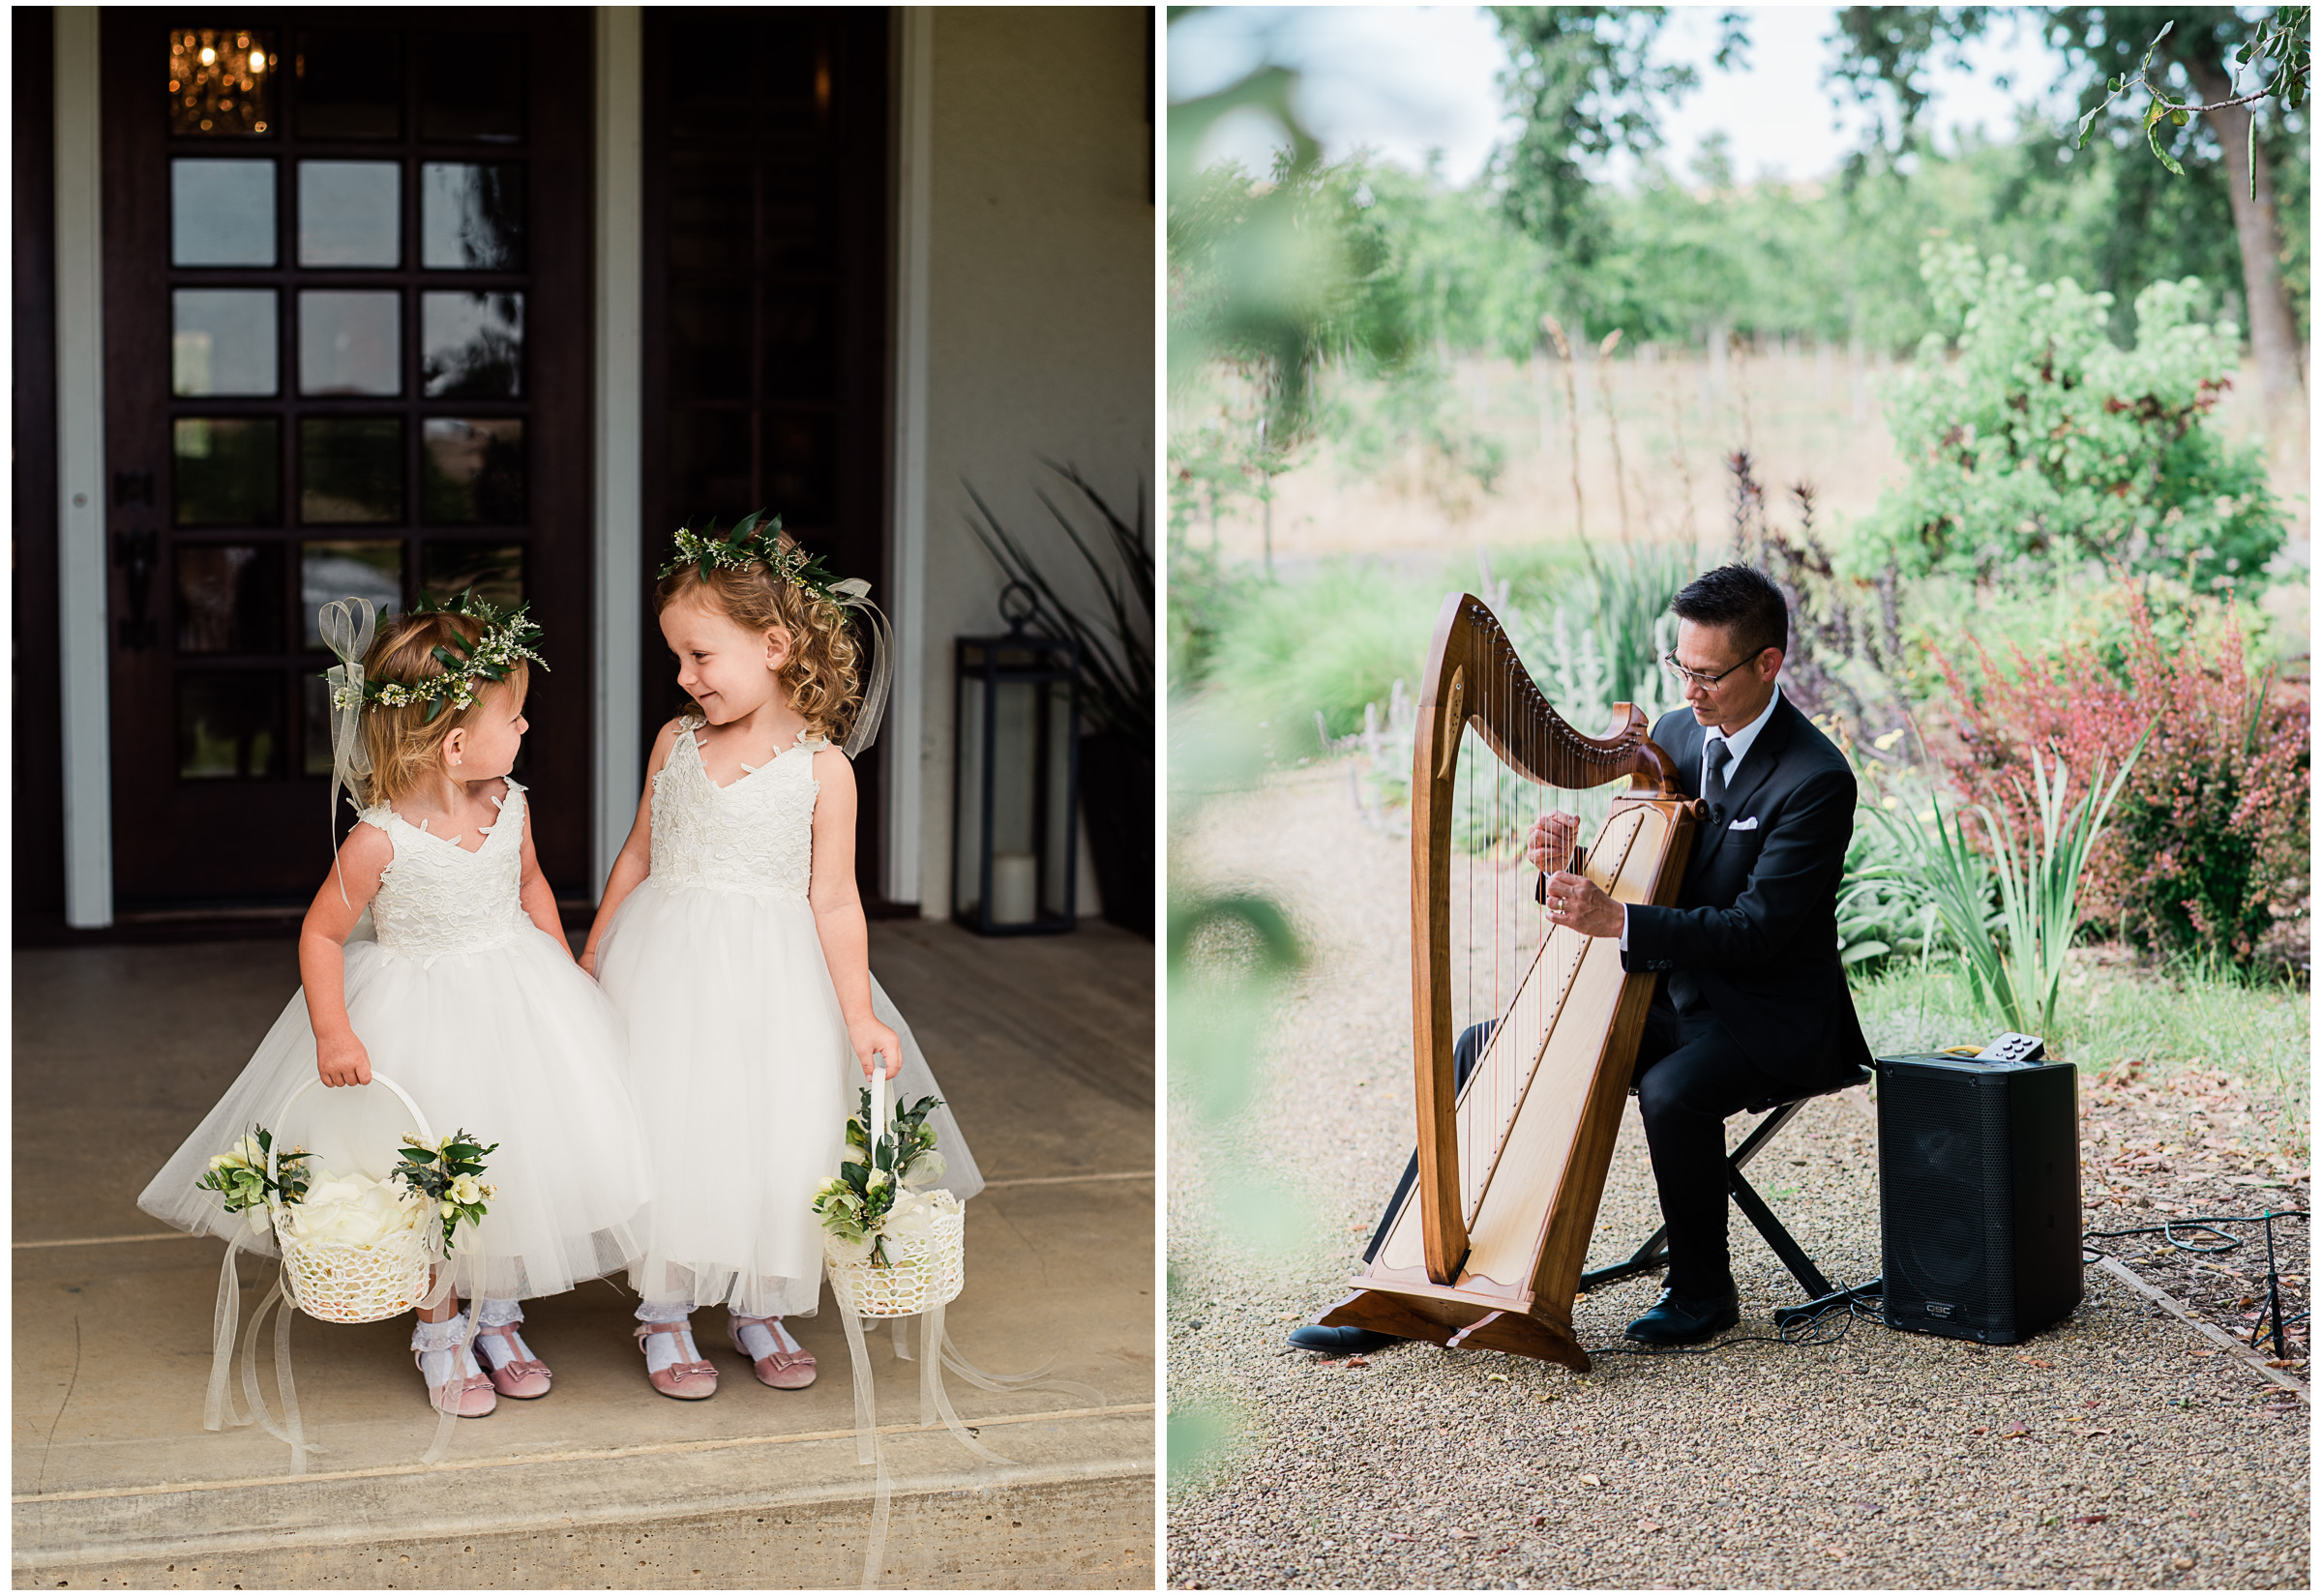 Winters Wedding - Sacramento Photographer - Field & Pond - Justin Wilcox Photography - 20.jpg